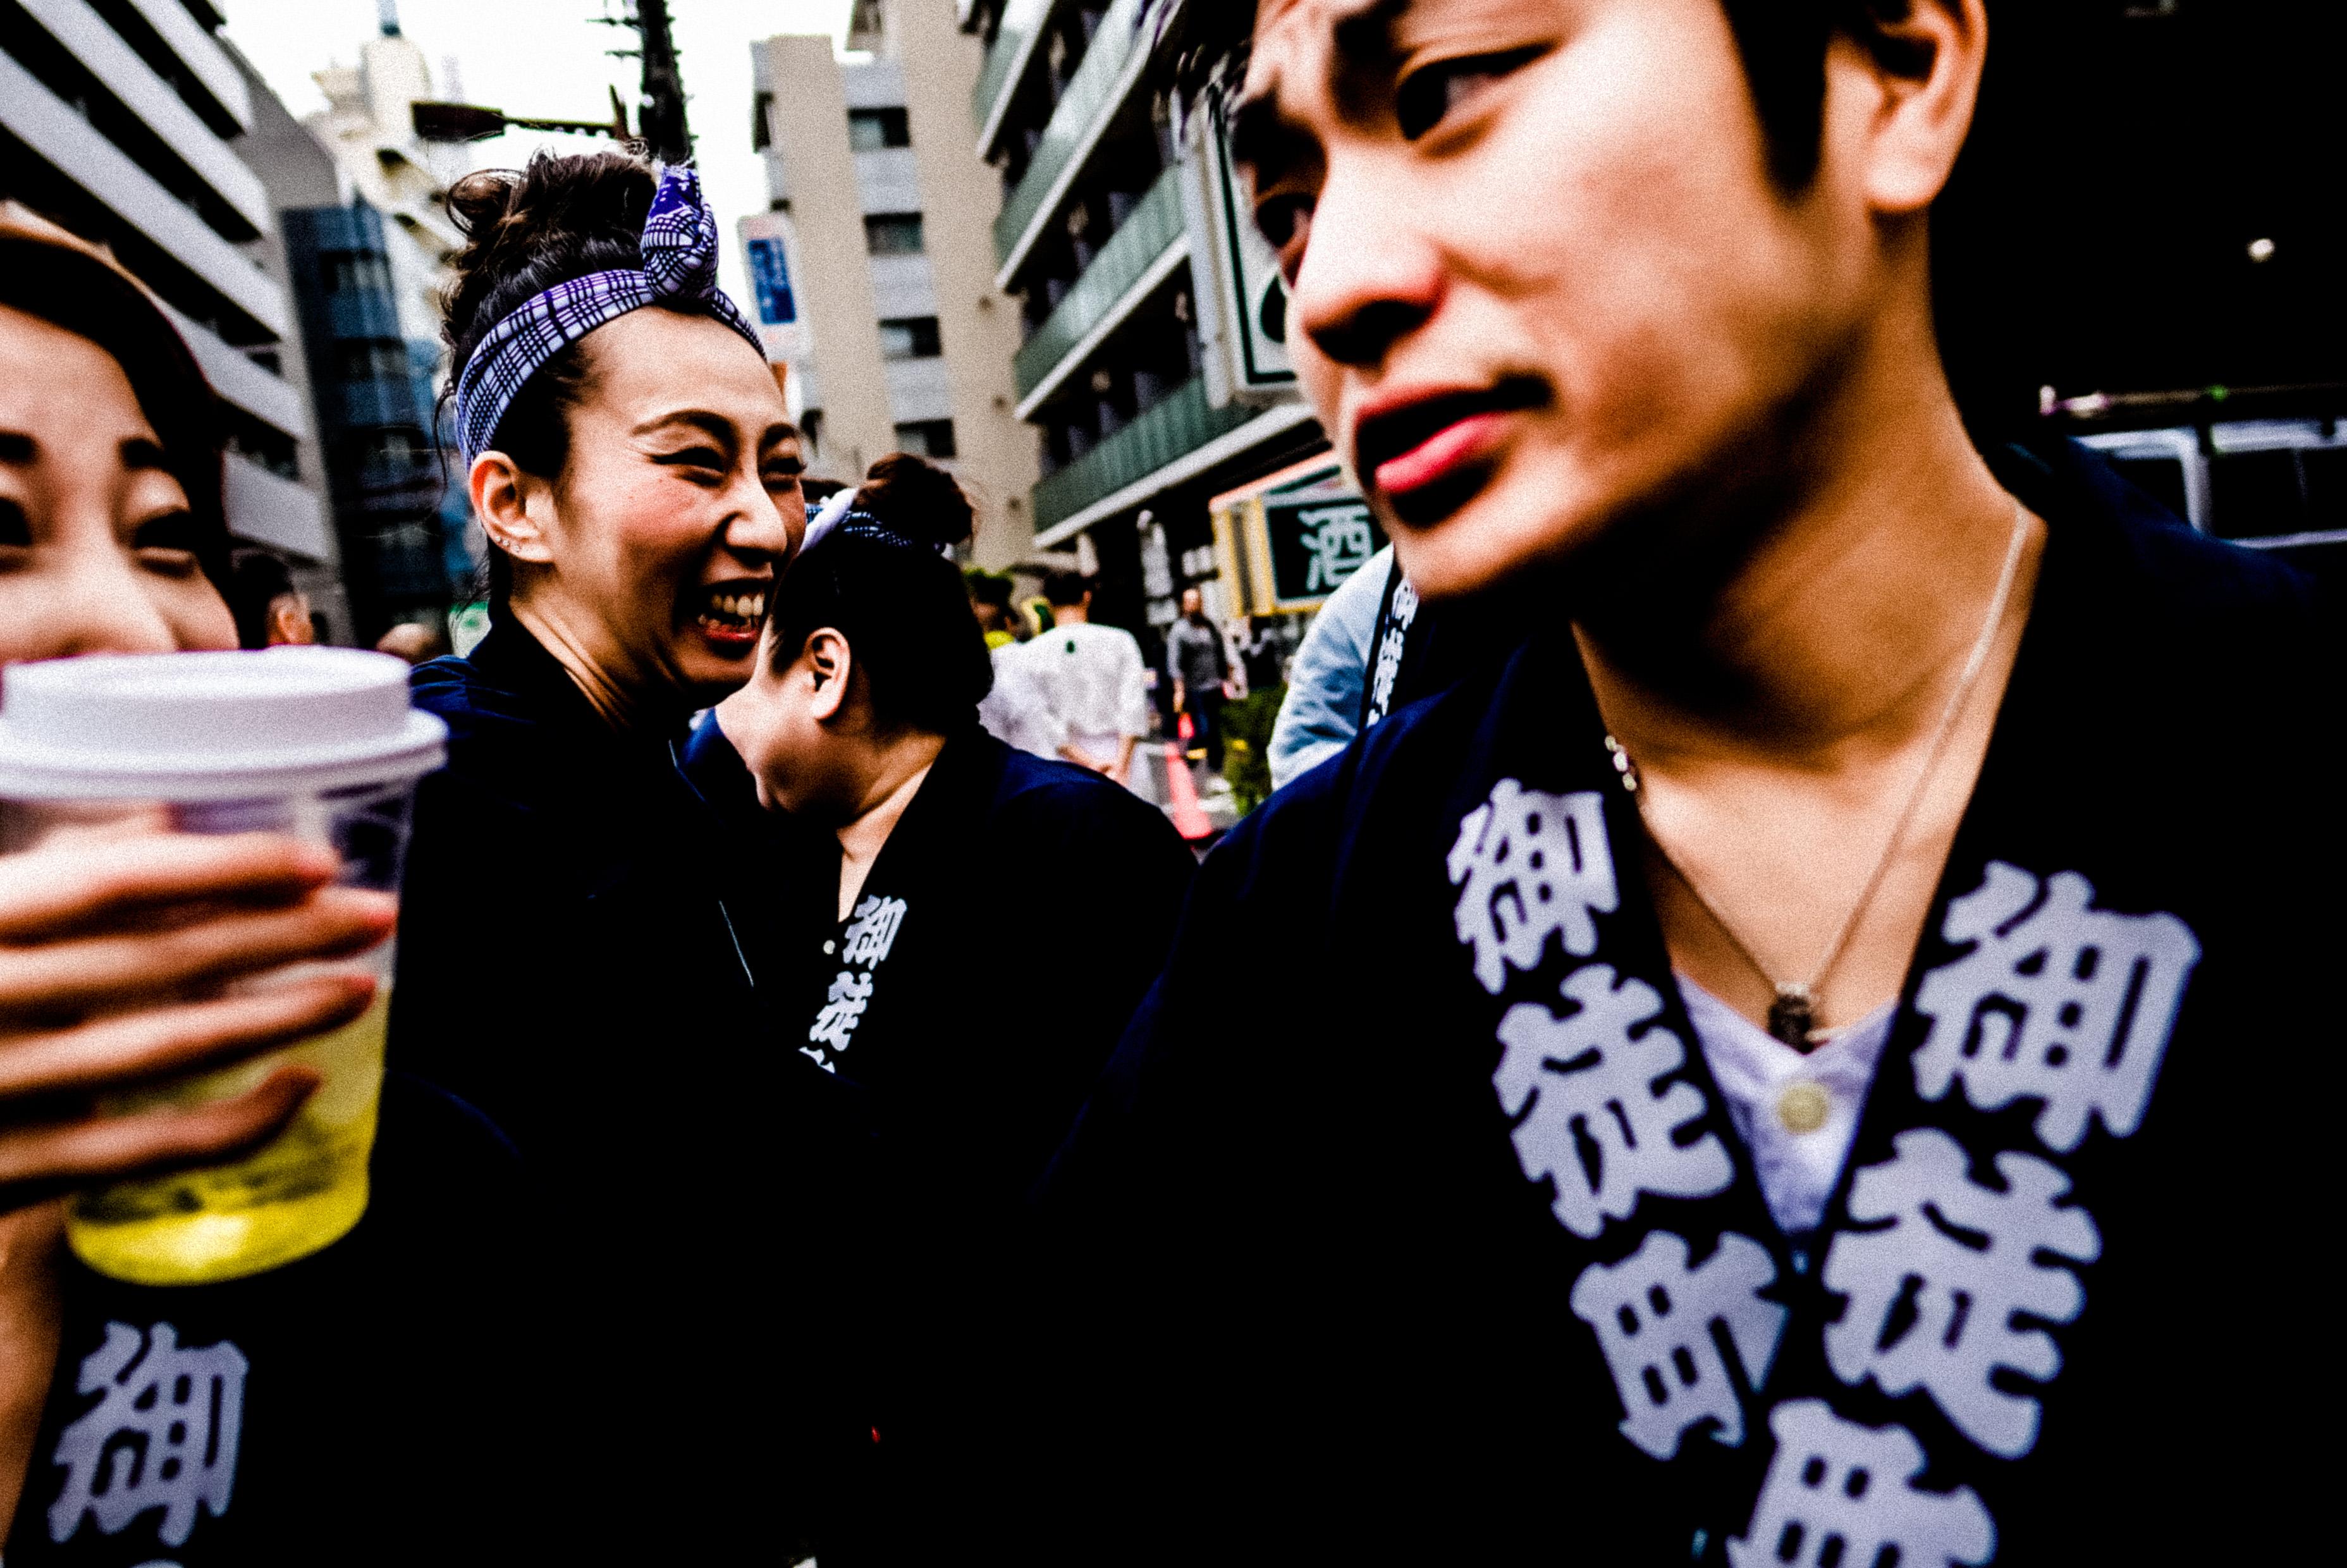 eric kim street photography tokyo 2018-1057229